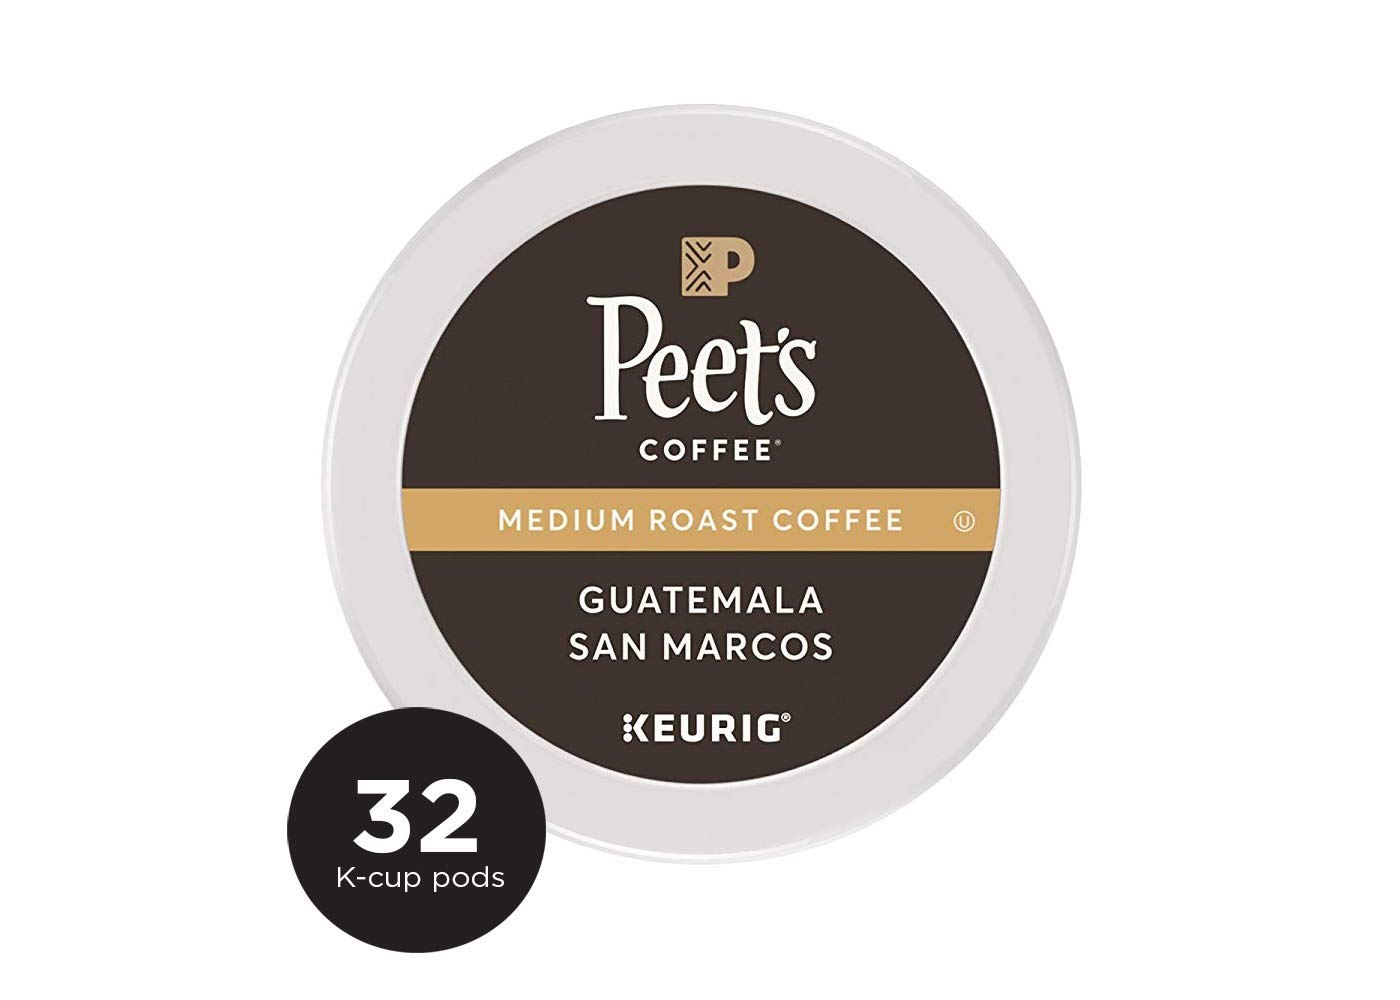 Peet's Coffee Single Origin Guatemala, Medium Roast, 32 Count Single Serve K-Cup Coffee Pods for Keurig Coffee Maker